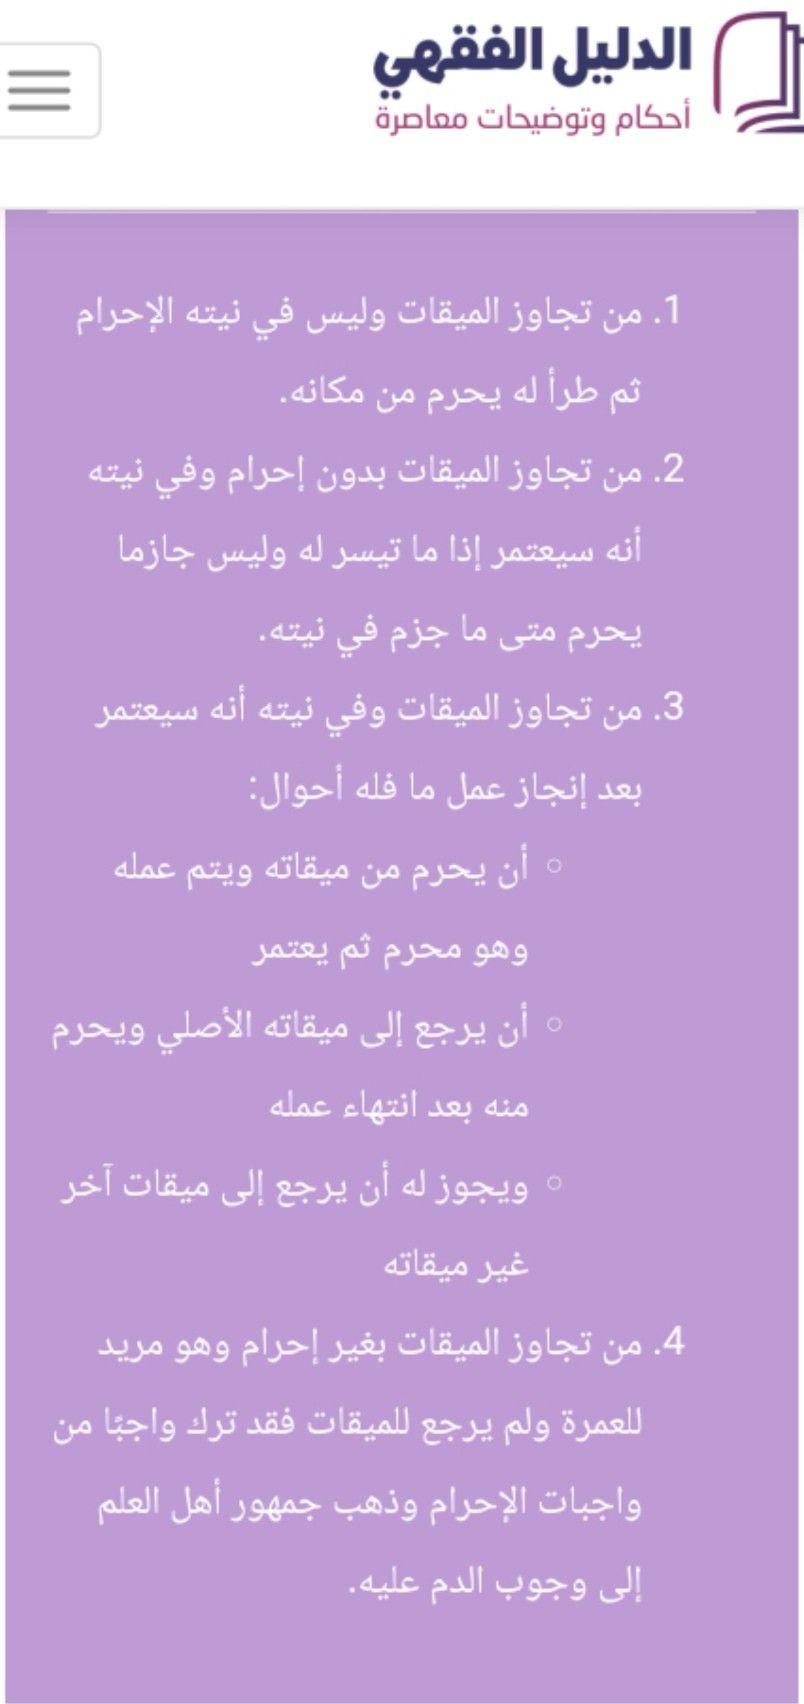 Pin by د. إبراهيم on ابراهيم in 2020 Screenshots